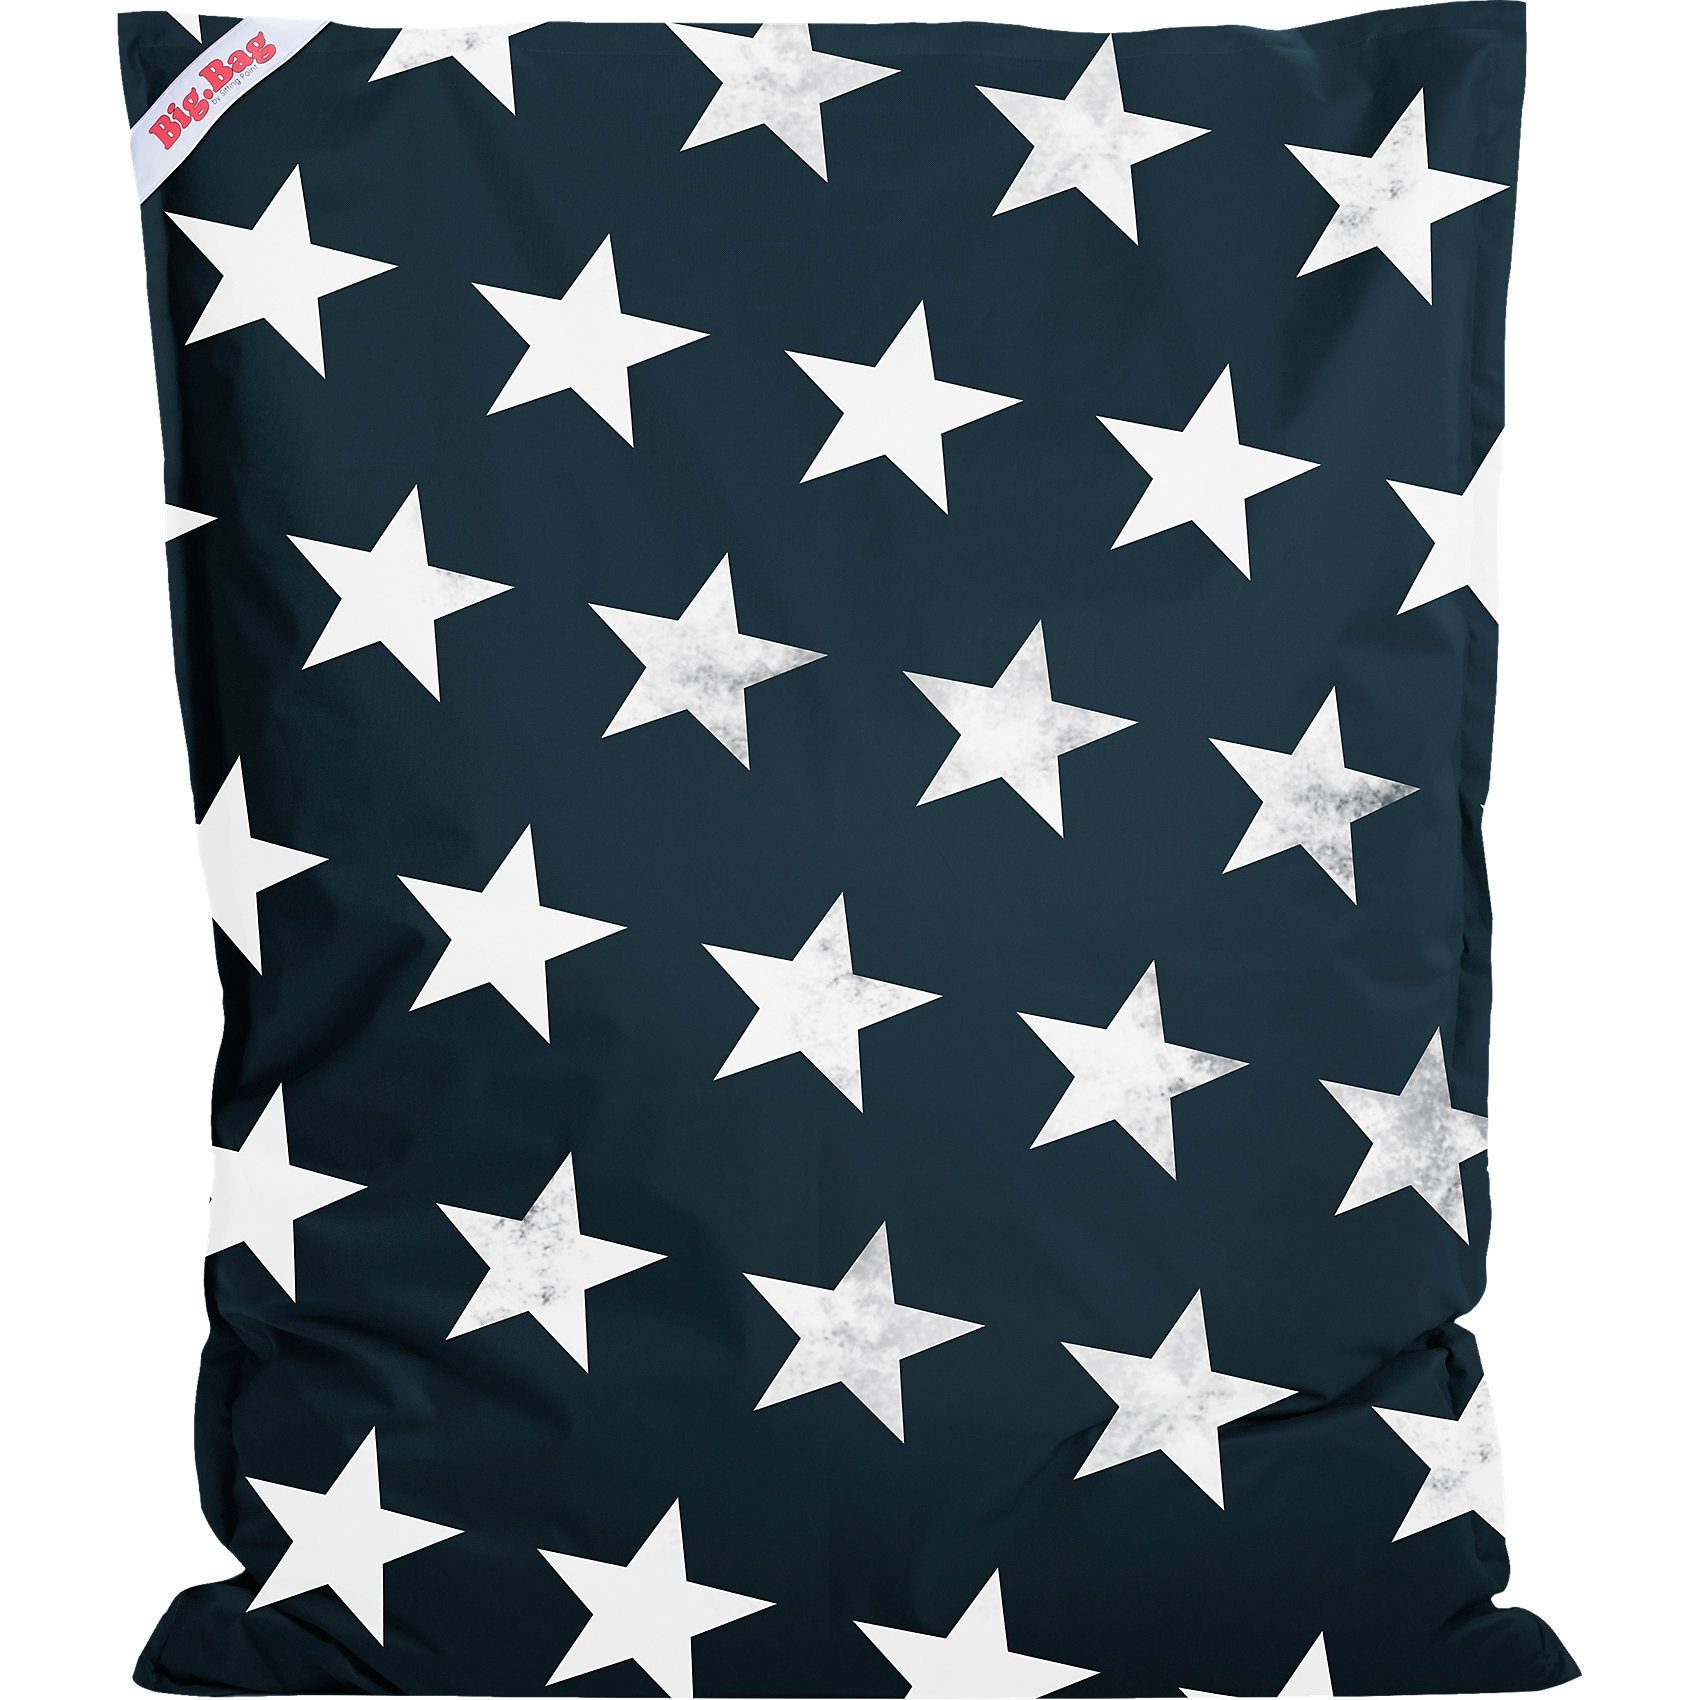 Sitting Point Sitzsack BigBag STARS, 130 x 170 cm, jeansblau